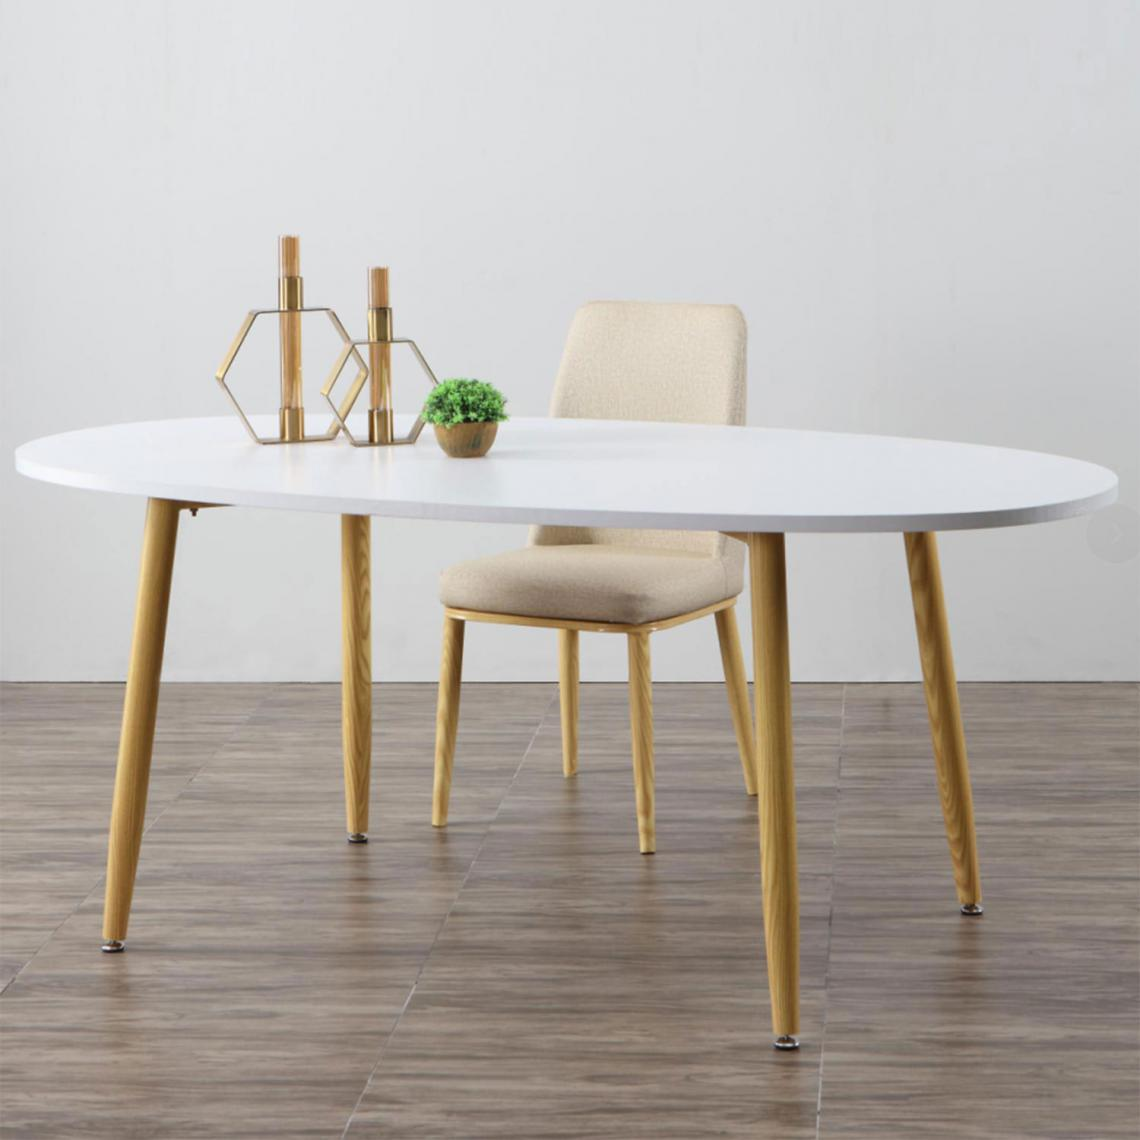 Table Scandinave Ovale Beige et Blanche NOELLE   3 SUISSES